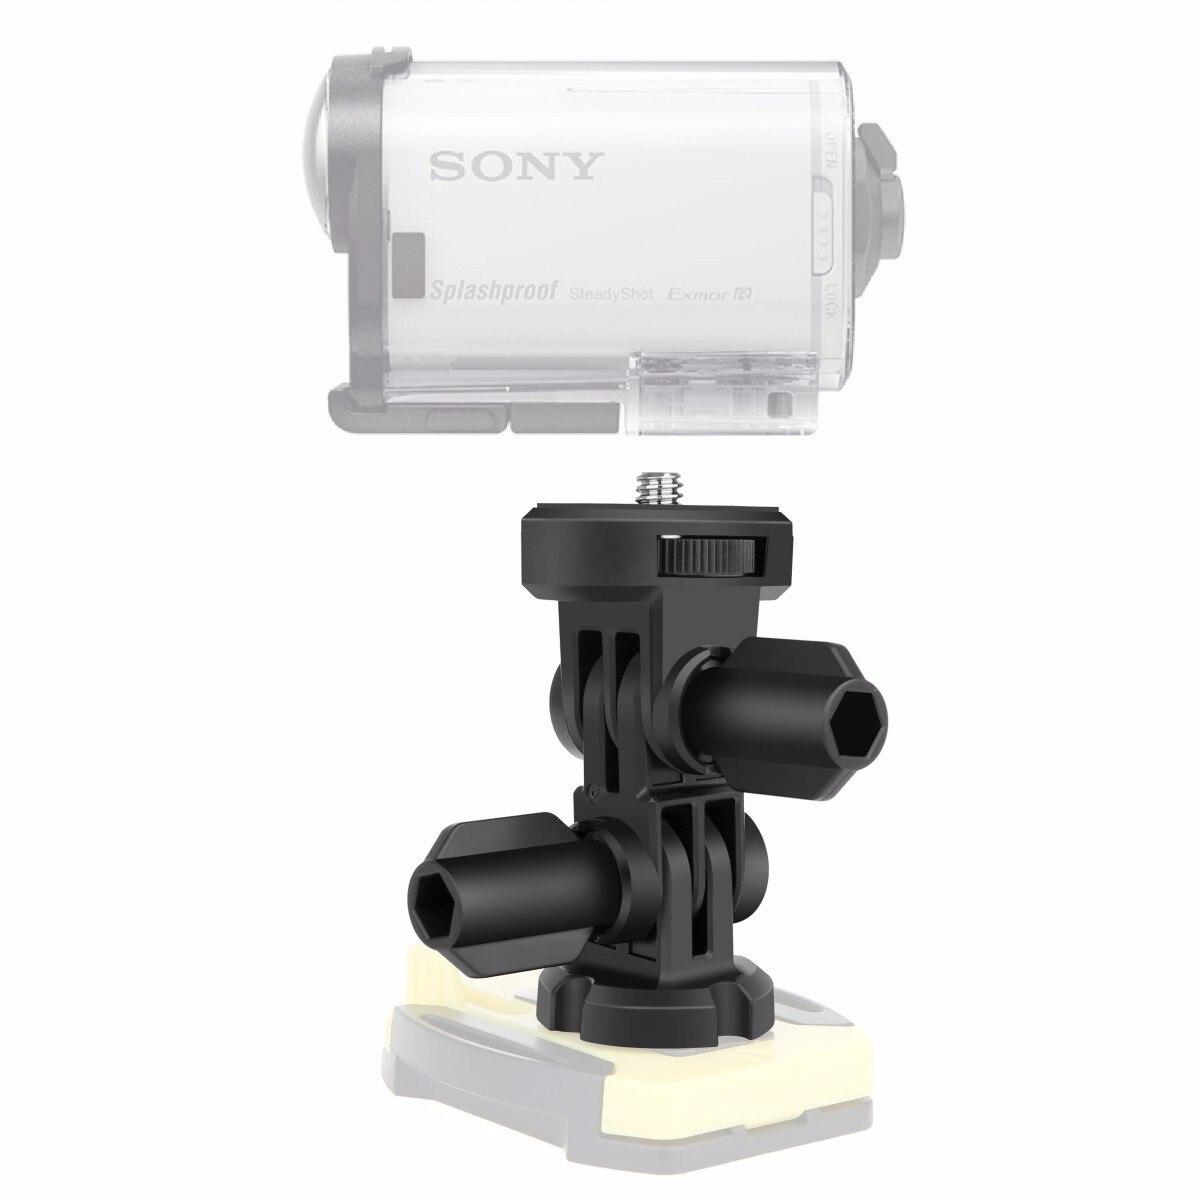 EACHSHOT DZ-AMK1 Three-way Adjustable Pivot Arm Kit Assembly for Sony action cam HDR-AS200V AS100V AS30V AS20V AZ1 FDR-X1000VR